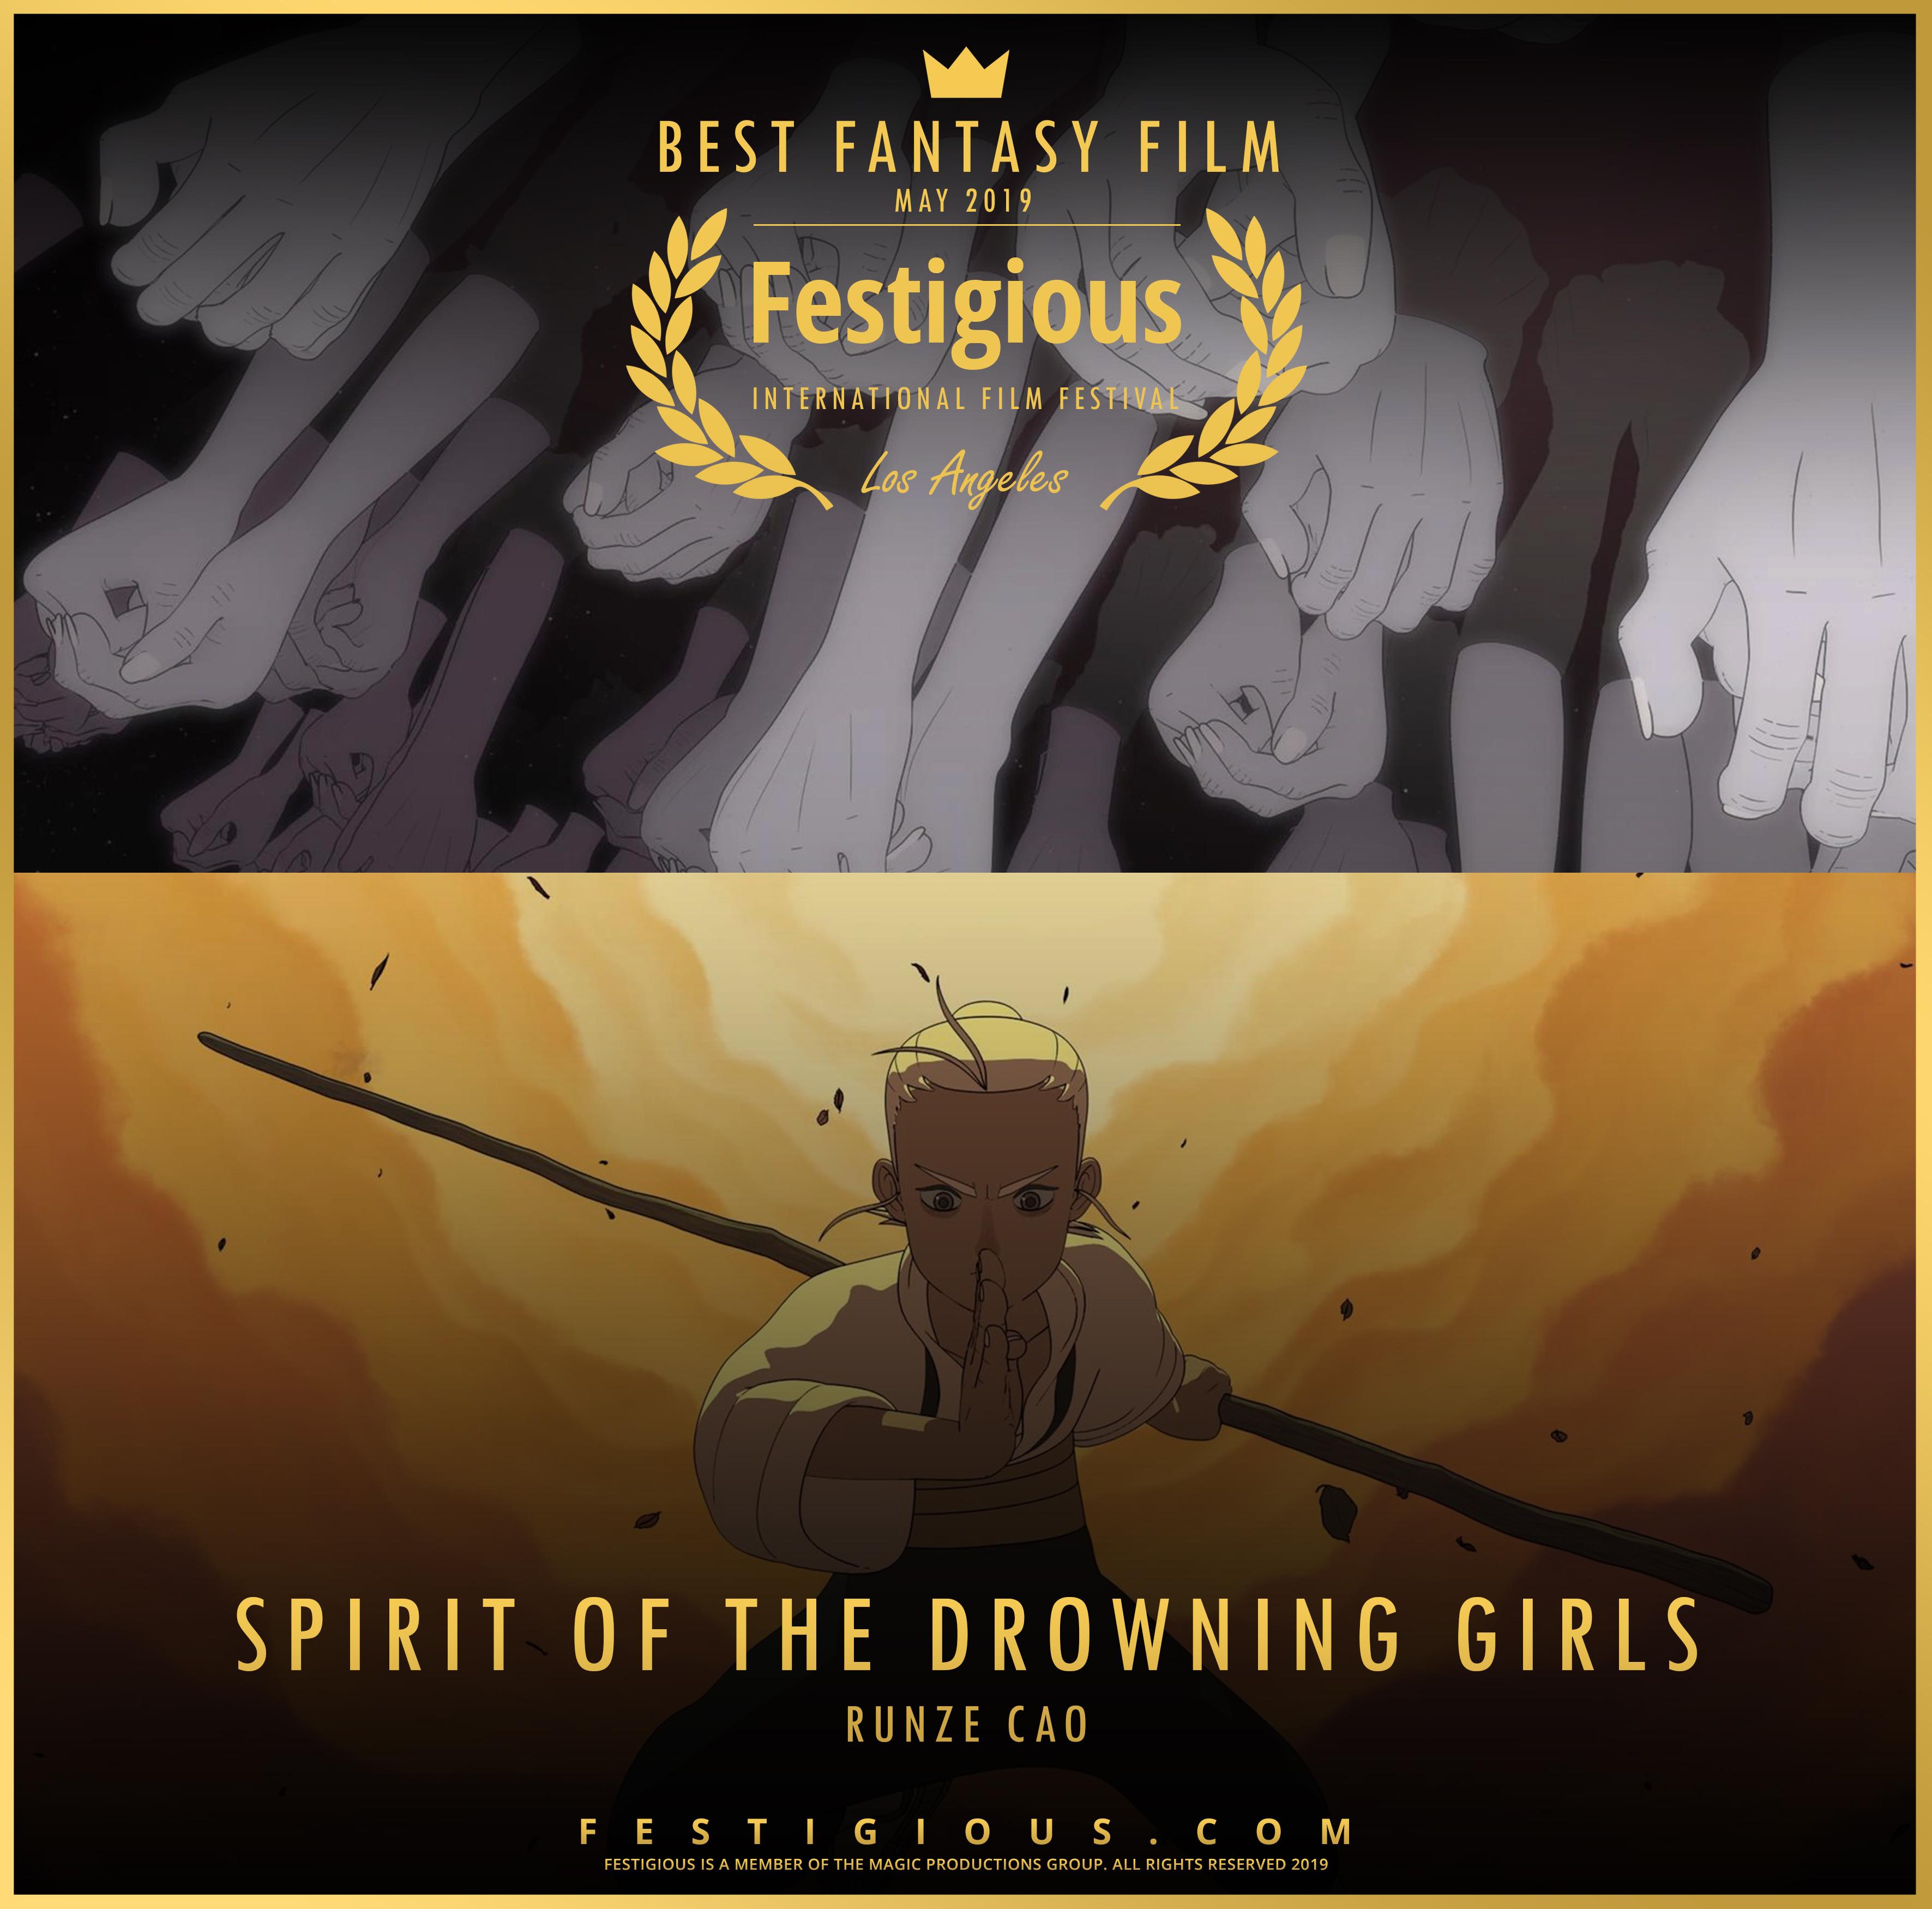 SPIRIT OF THE DROWNING GIRLS design